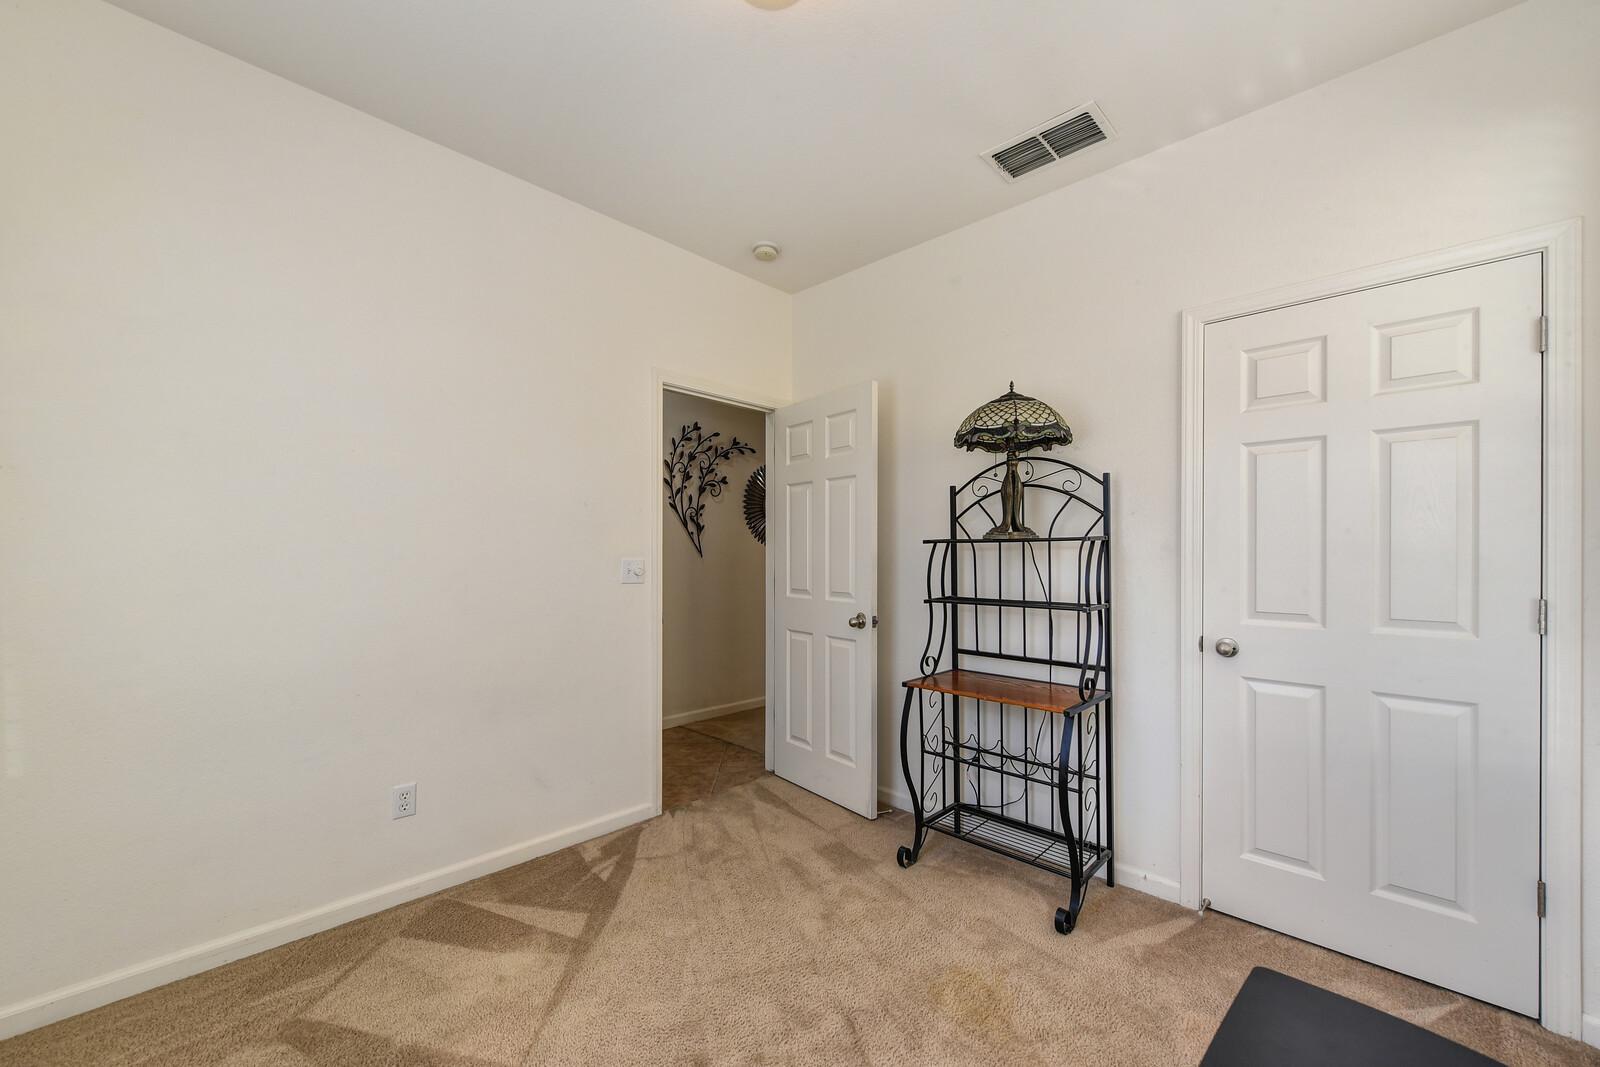 4 3151 Staysail Street First floor bedroom